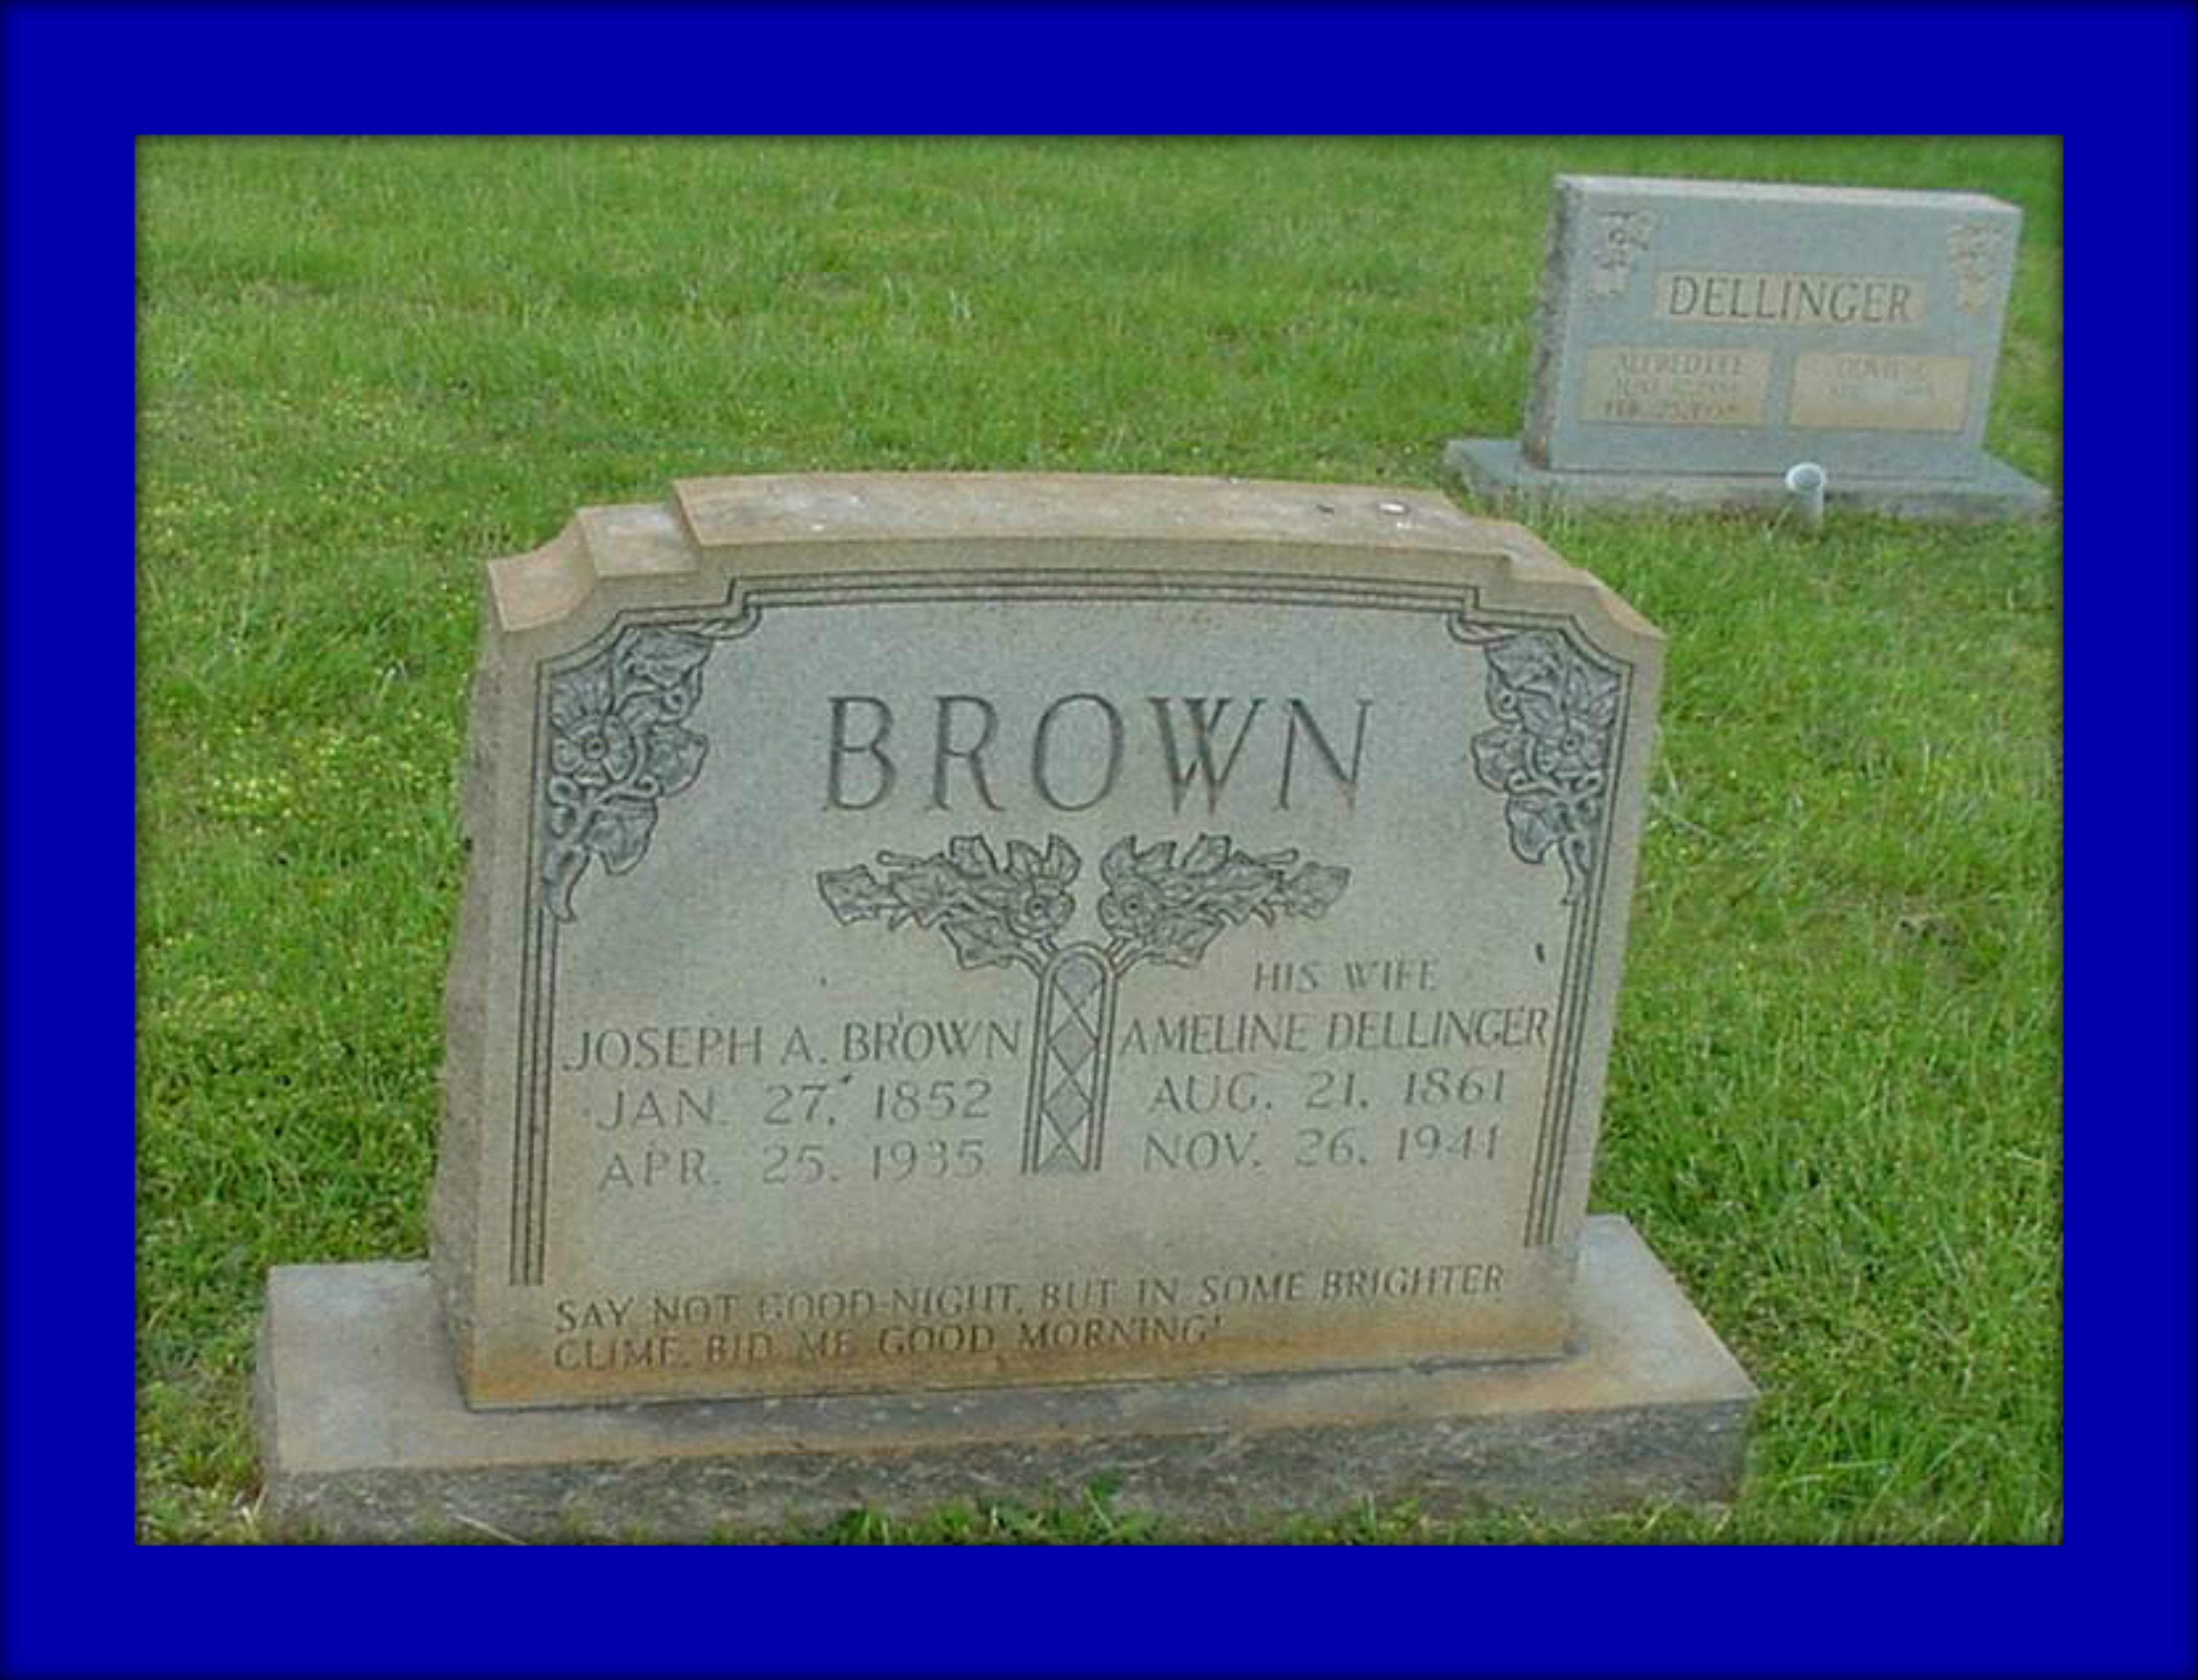 Joseph A. Brown